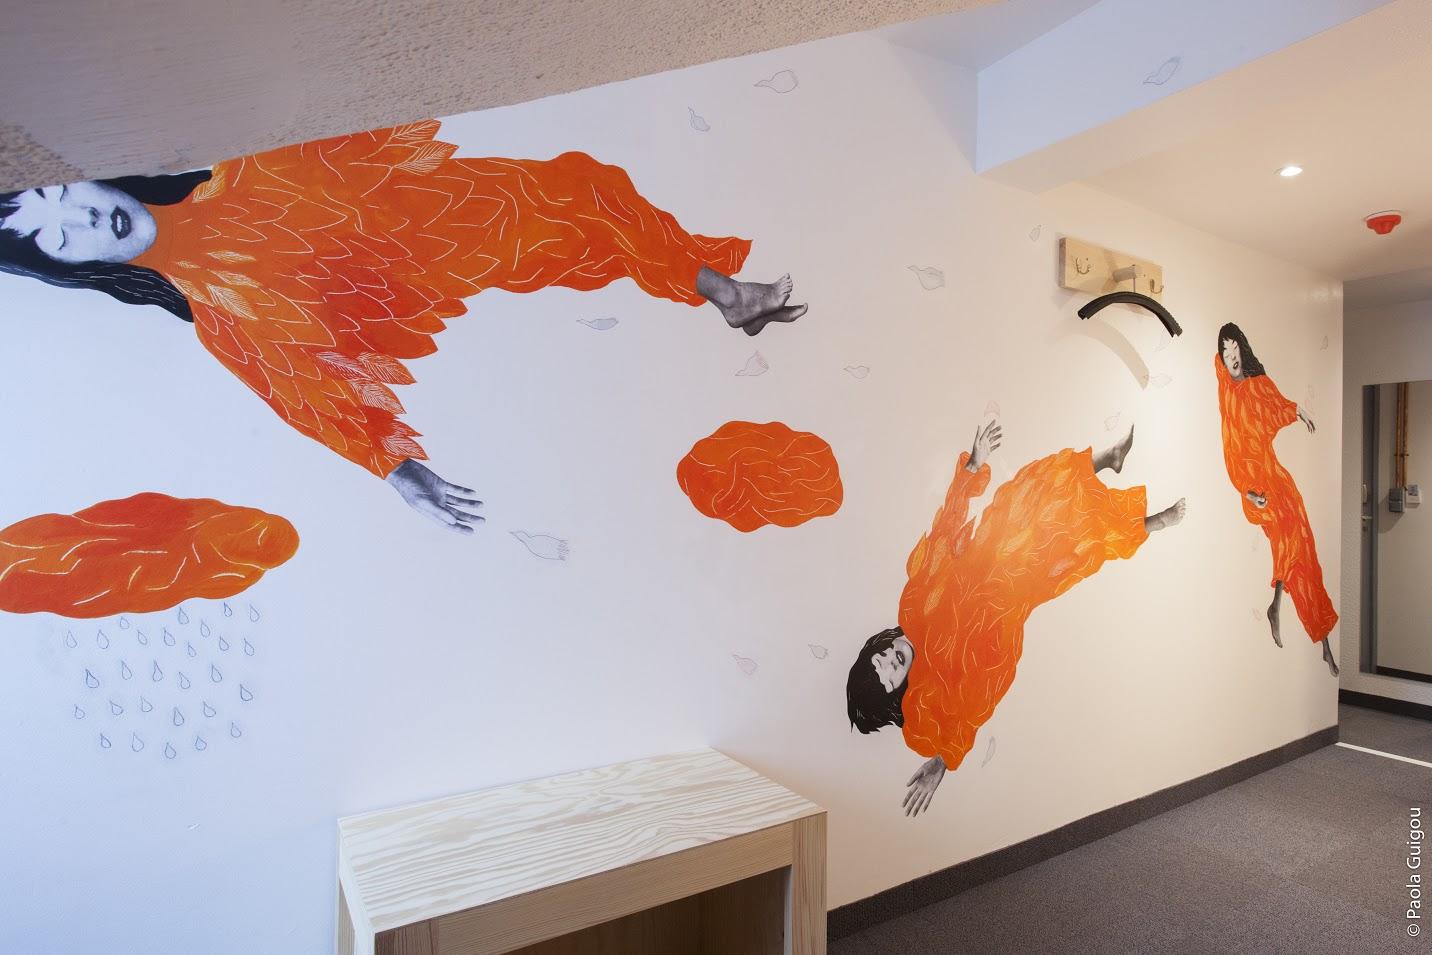 Room 405 by SHERLEY - (c) Paola Guigou - Graffalgar - 246